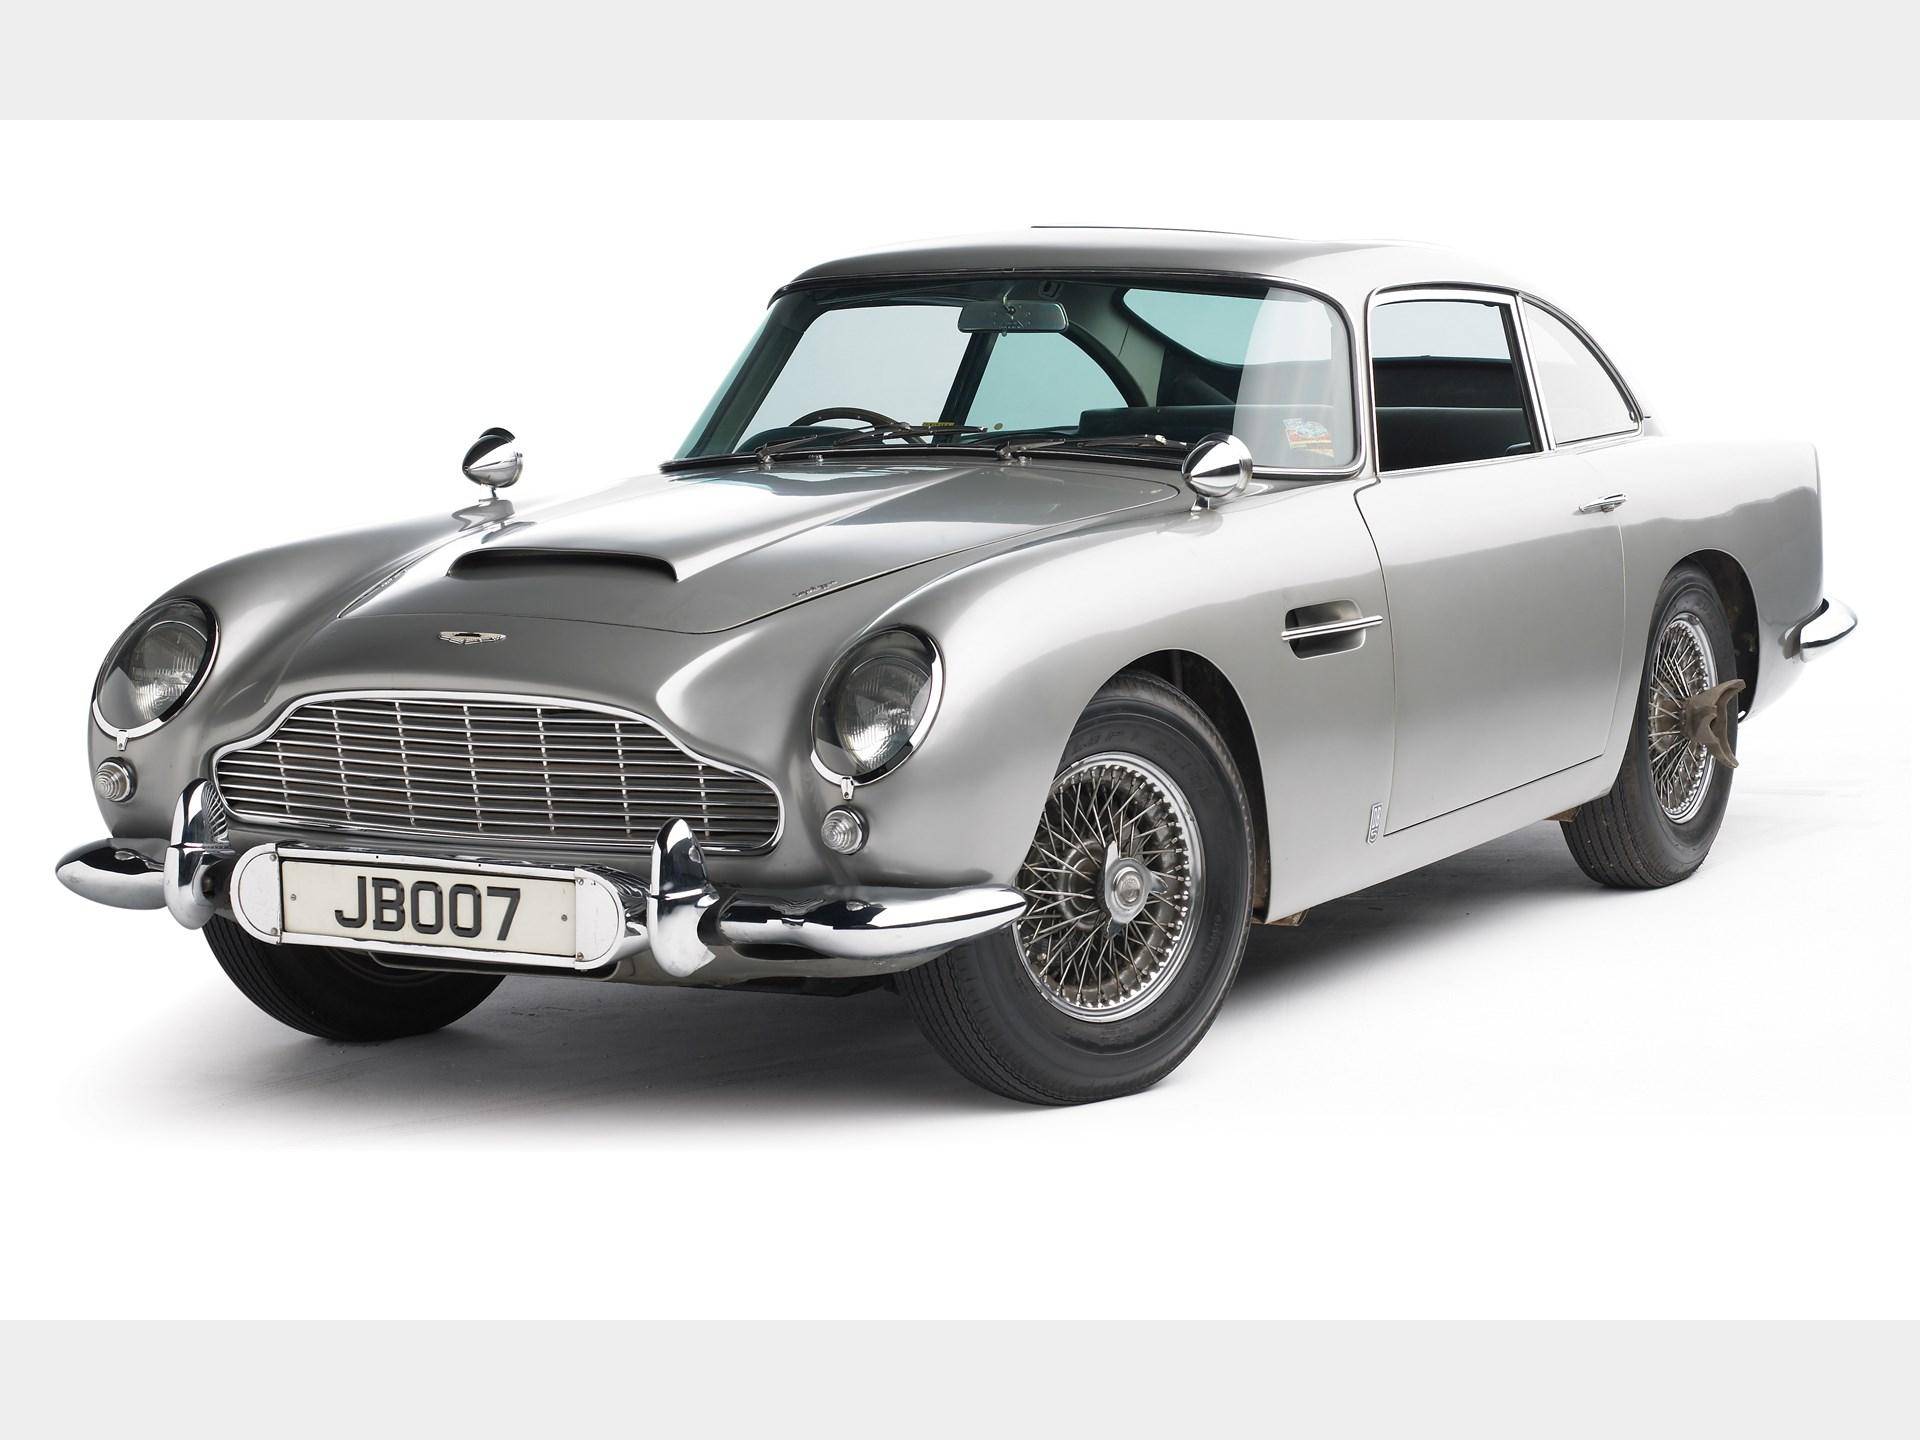 RM Sothebys Aston Martin DB Coupe Vintage Motor Cars In - Aston martin vintage